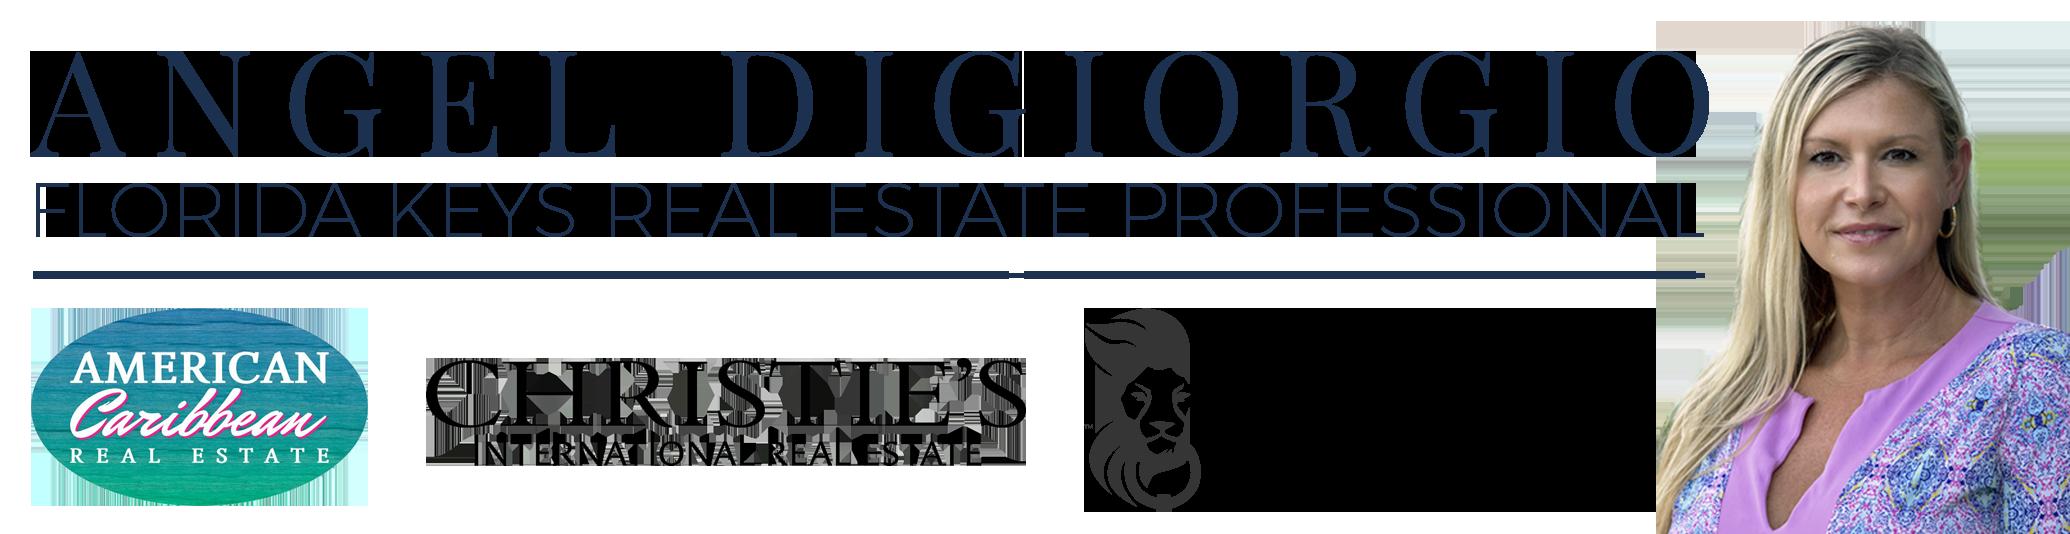 Banner for Angel Digiorgio Florida Keys Real Estate Professional